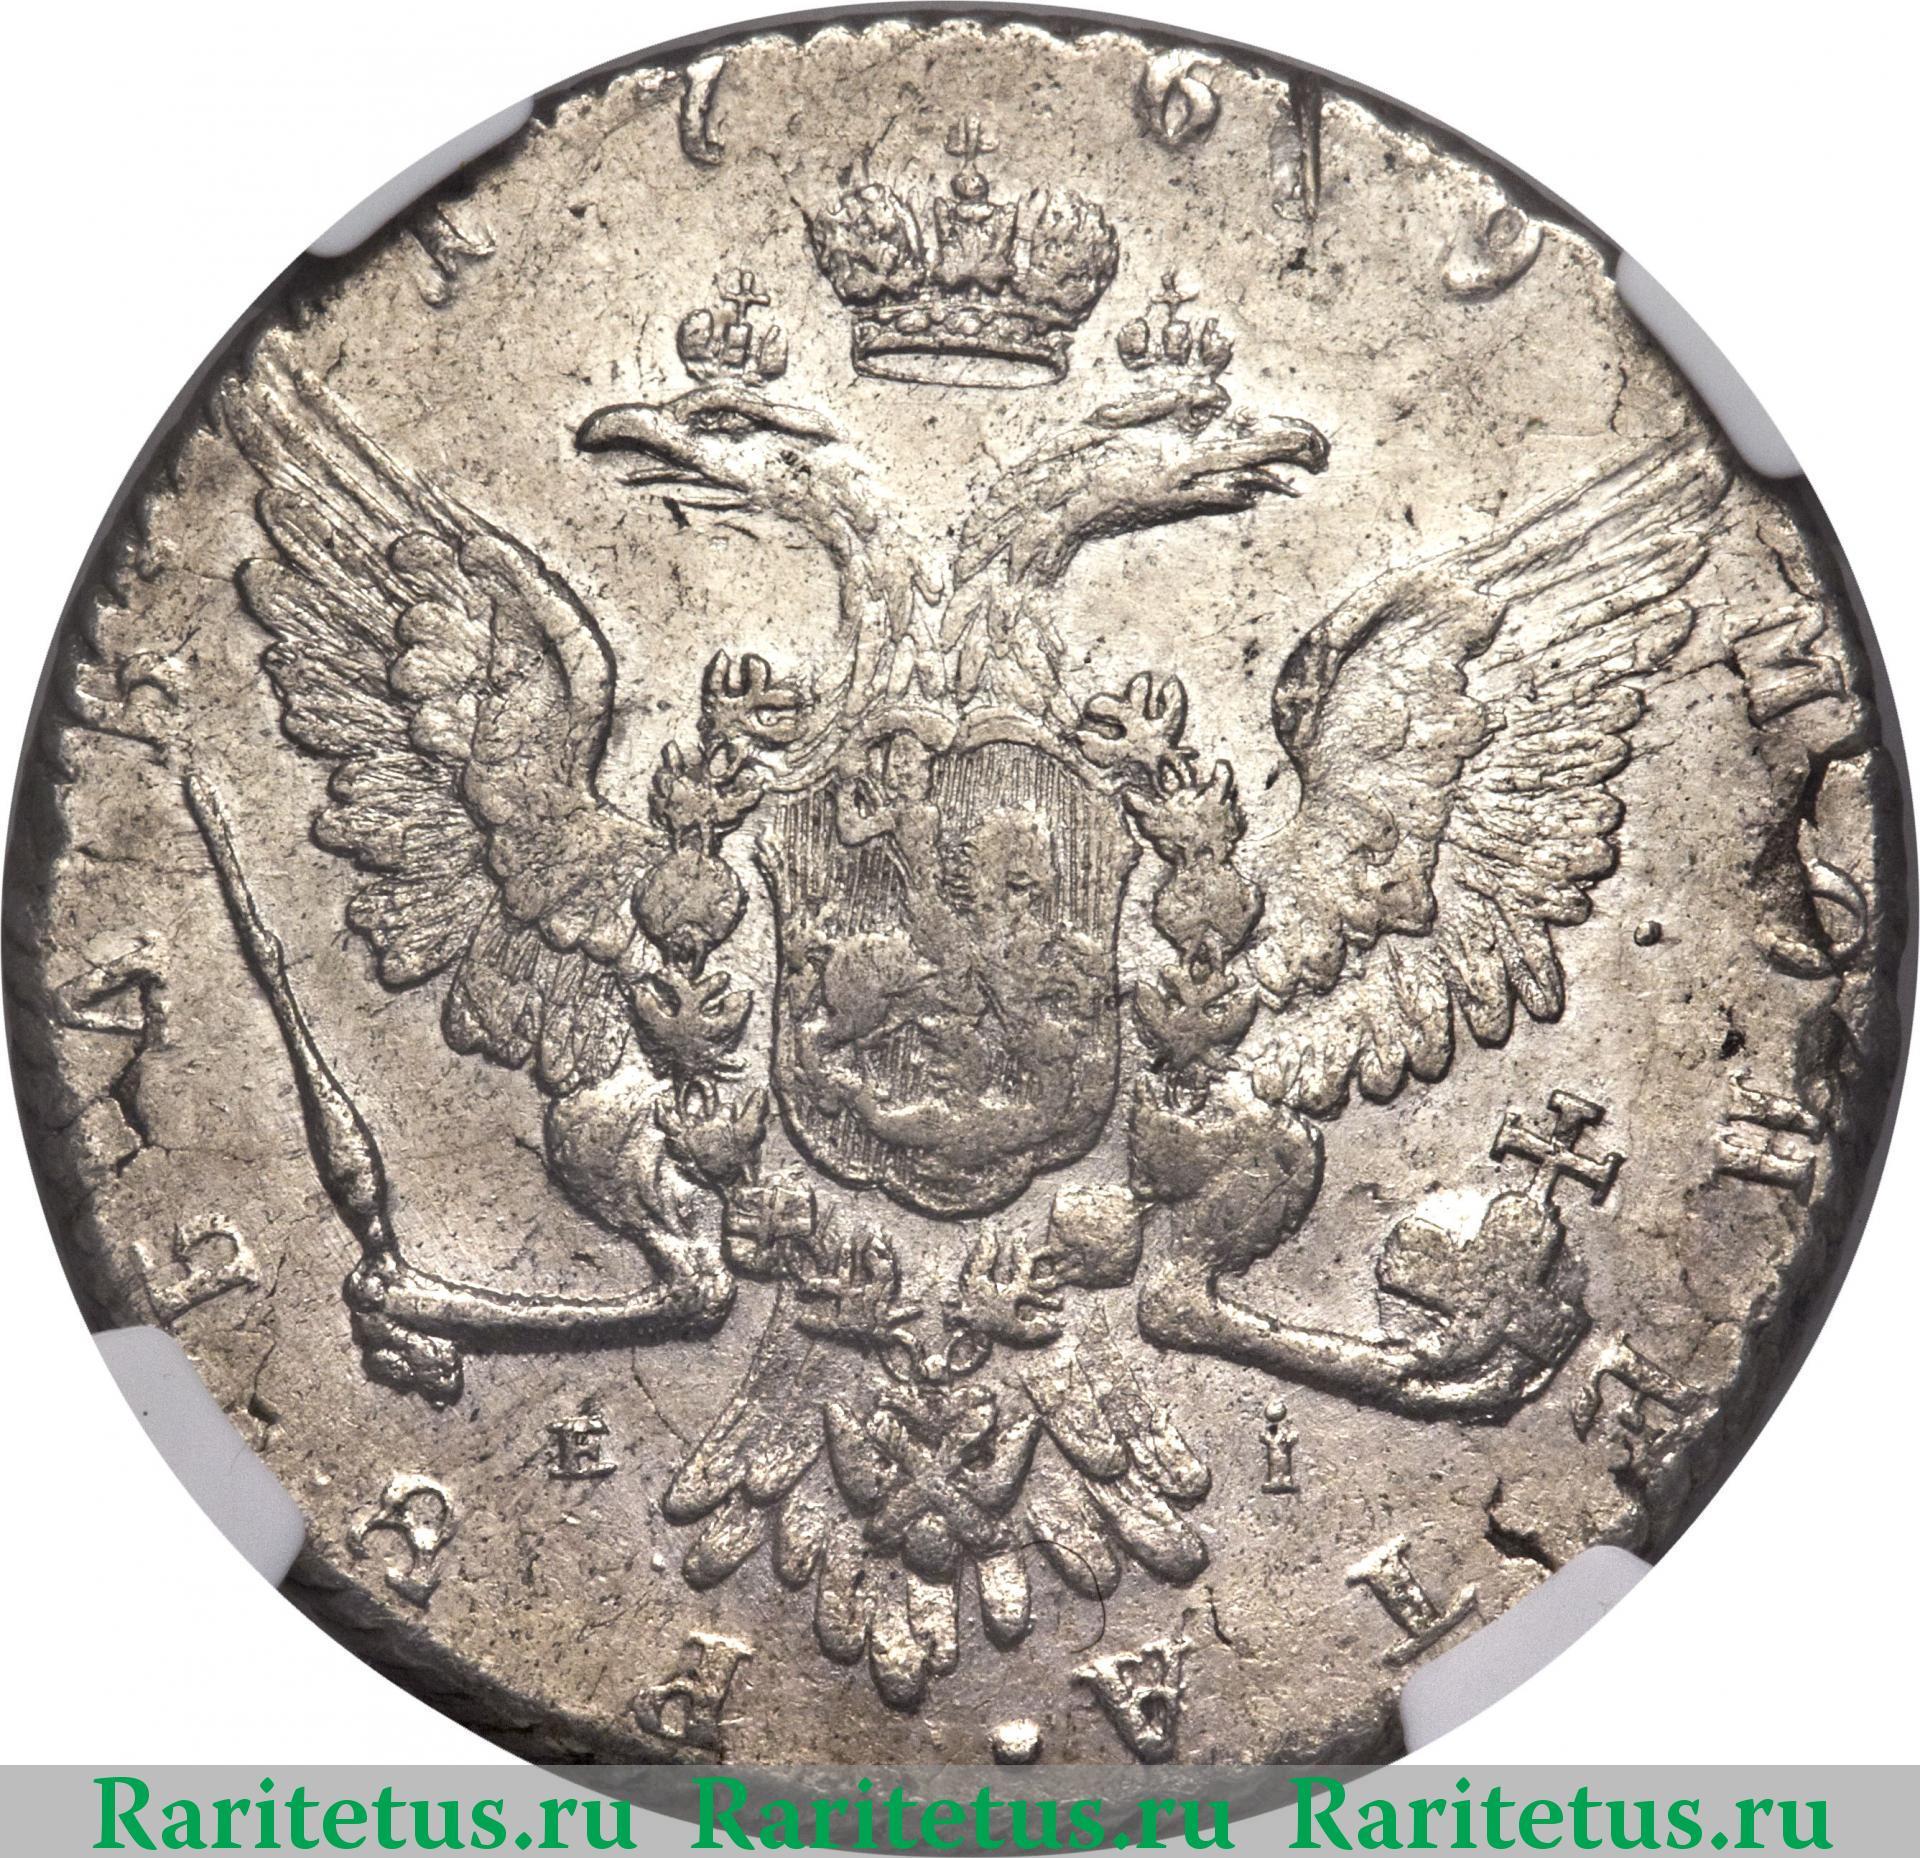 Рубль 1769 года цена тихвин монета 10 рублей 2014 года